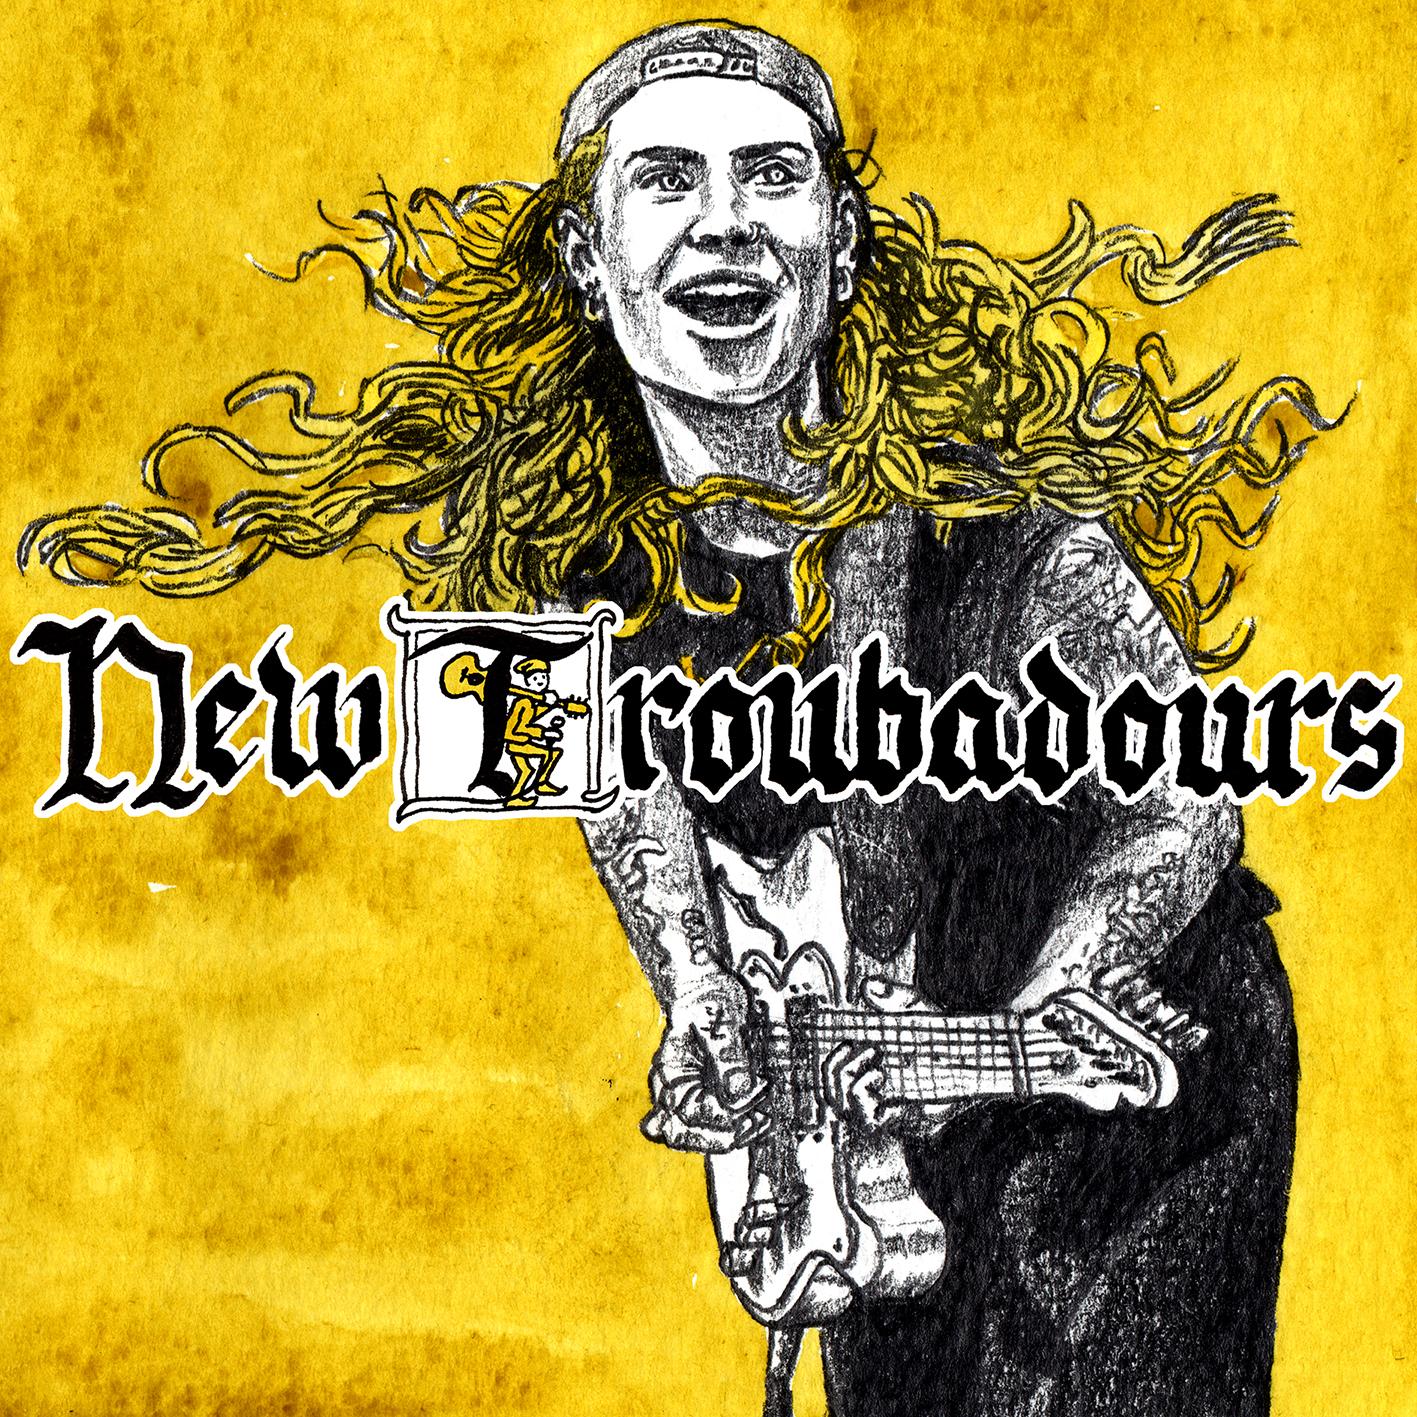 NewTroubadoursYellow.jpg